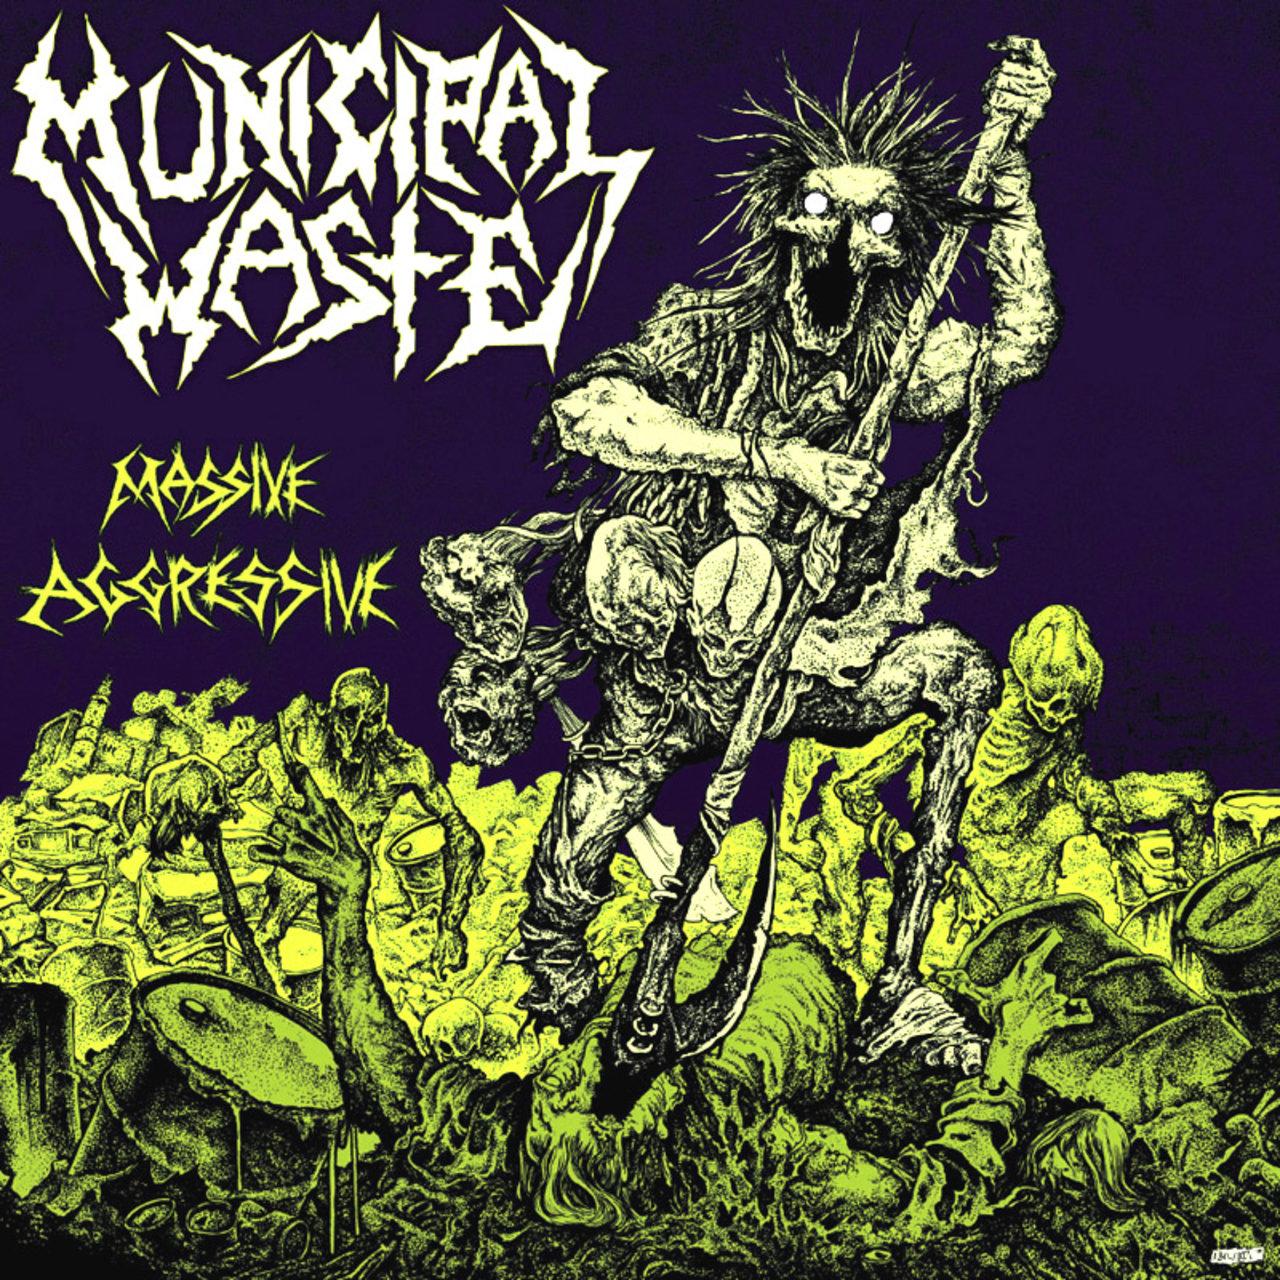 Municipal waste live review london, underworld